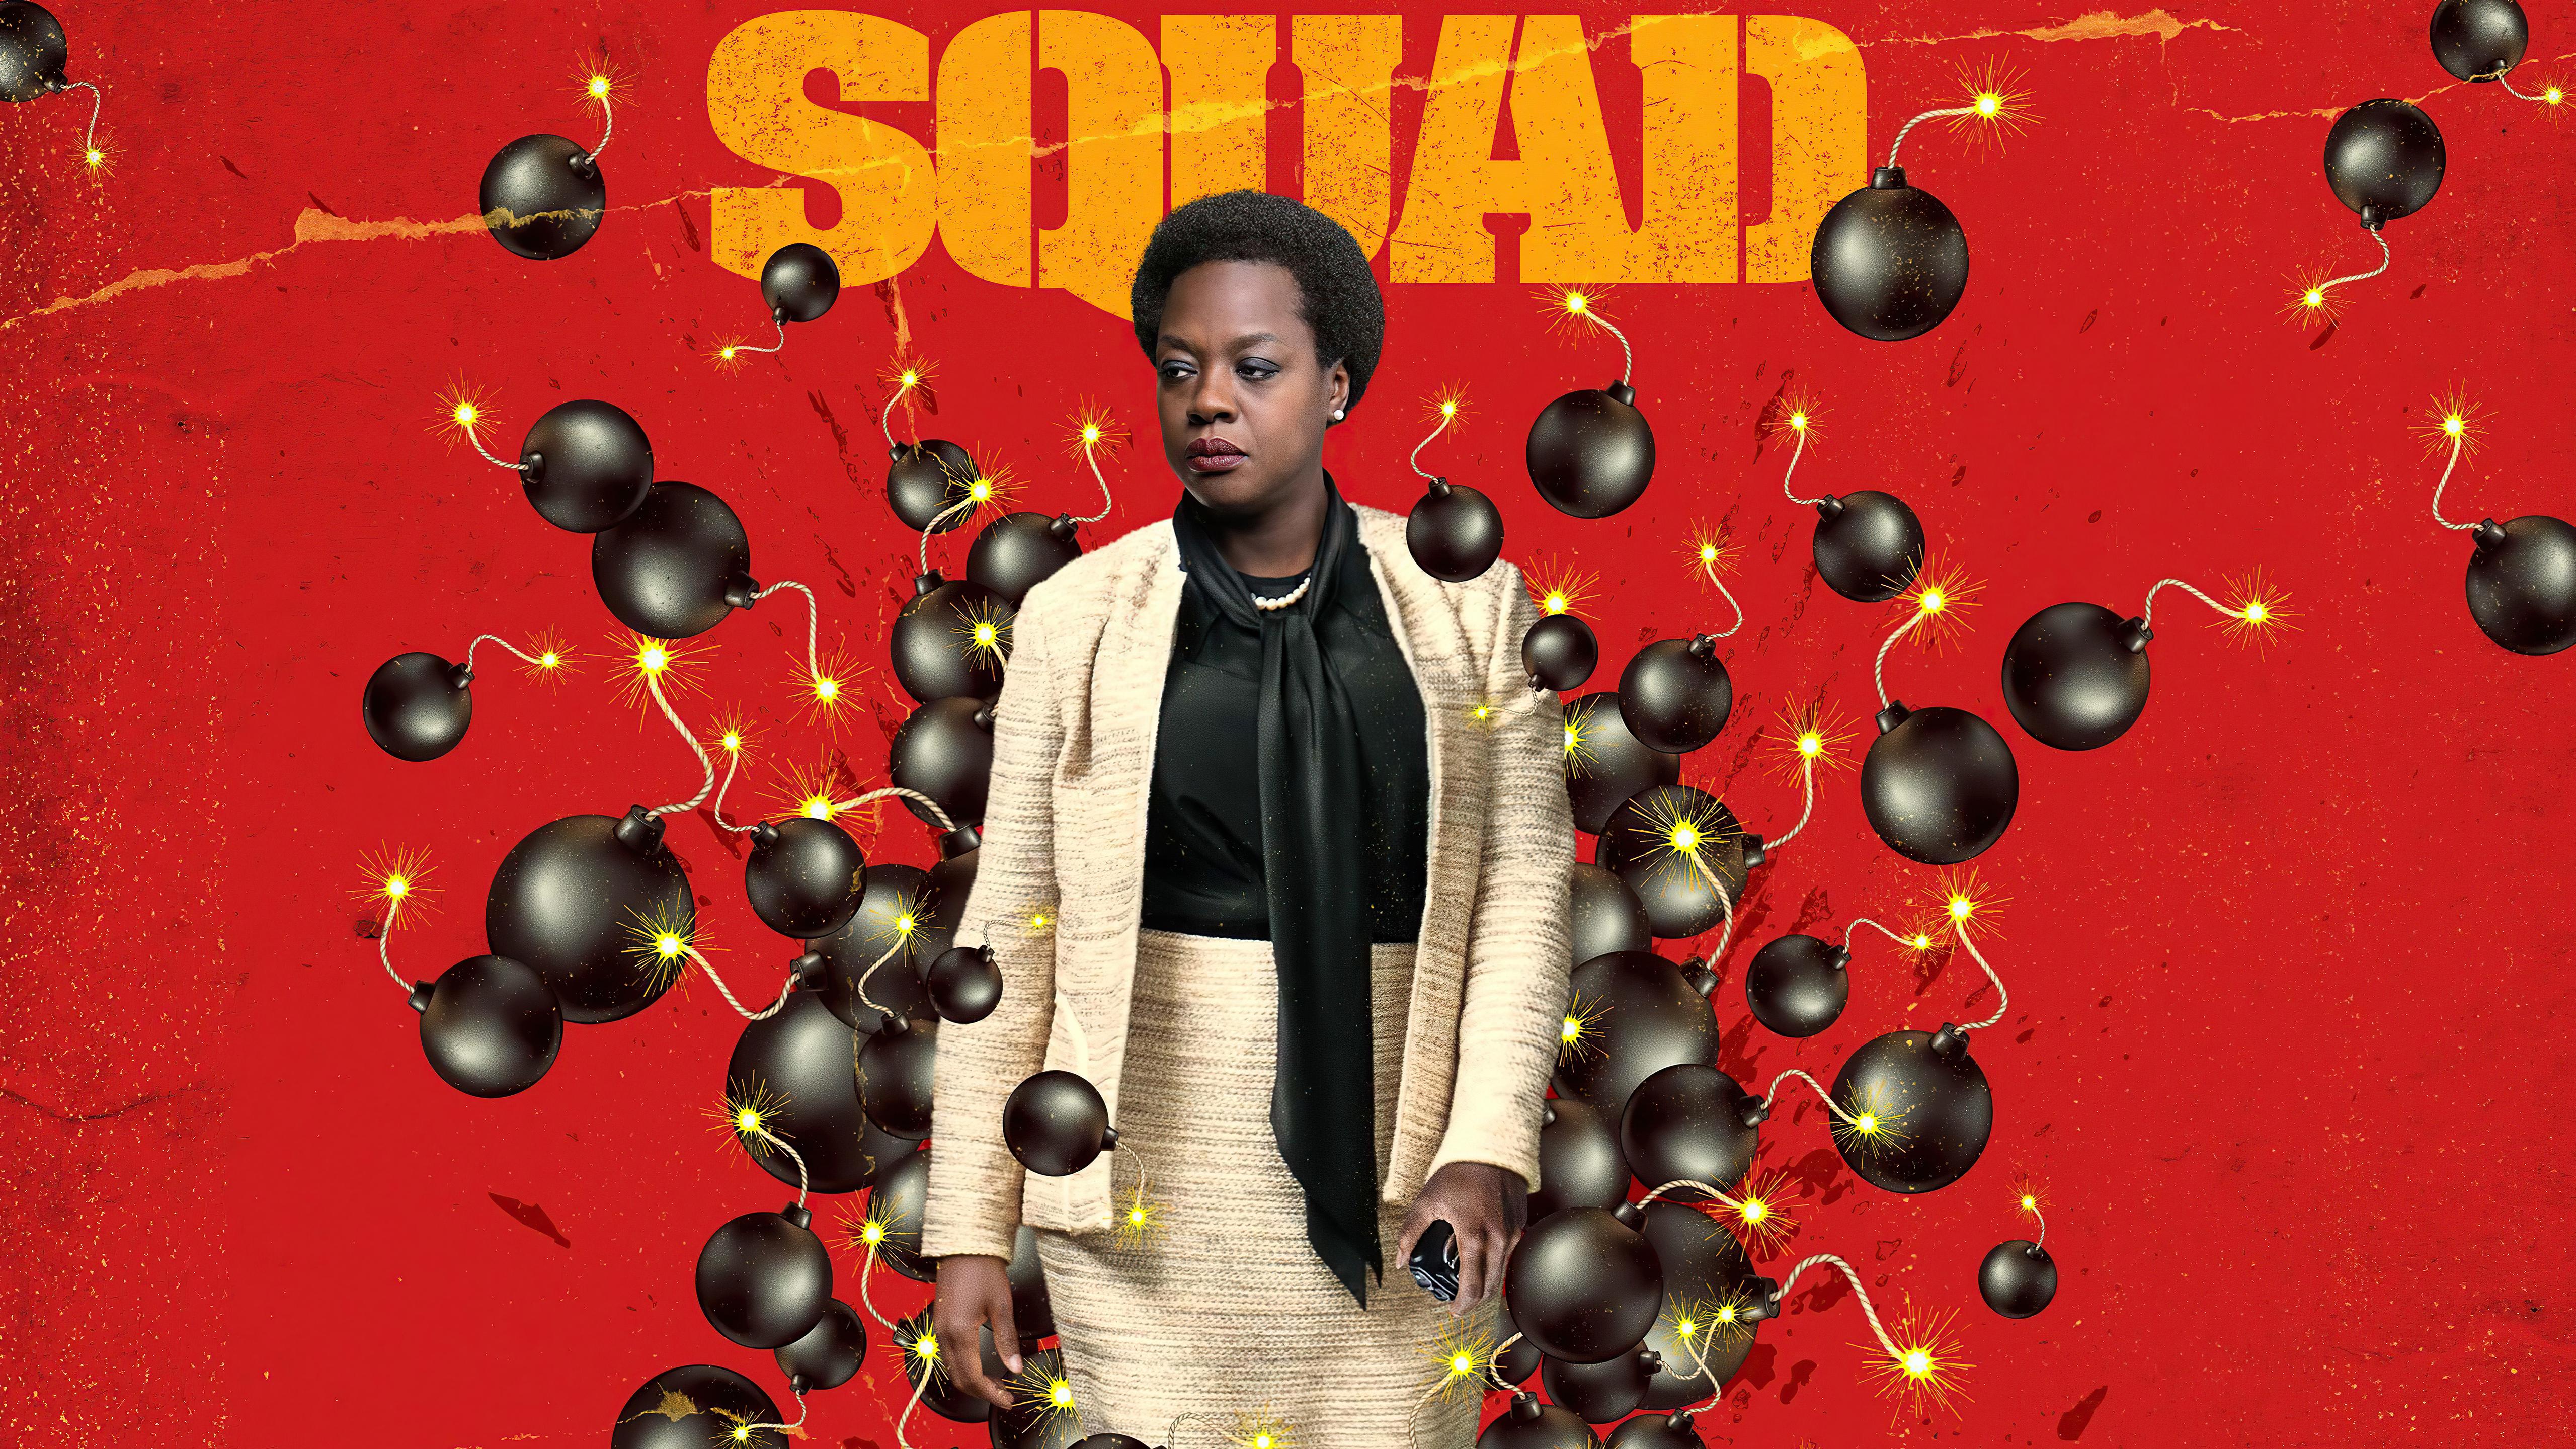 amanda waller the suicide squad 4k 1618166347 - Amanda Waller The Suicide Squad 4k - Amanda Waller The Suicide Squad 4k wallpapers